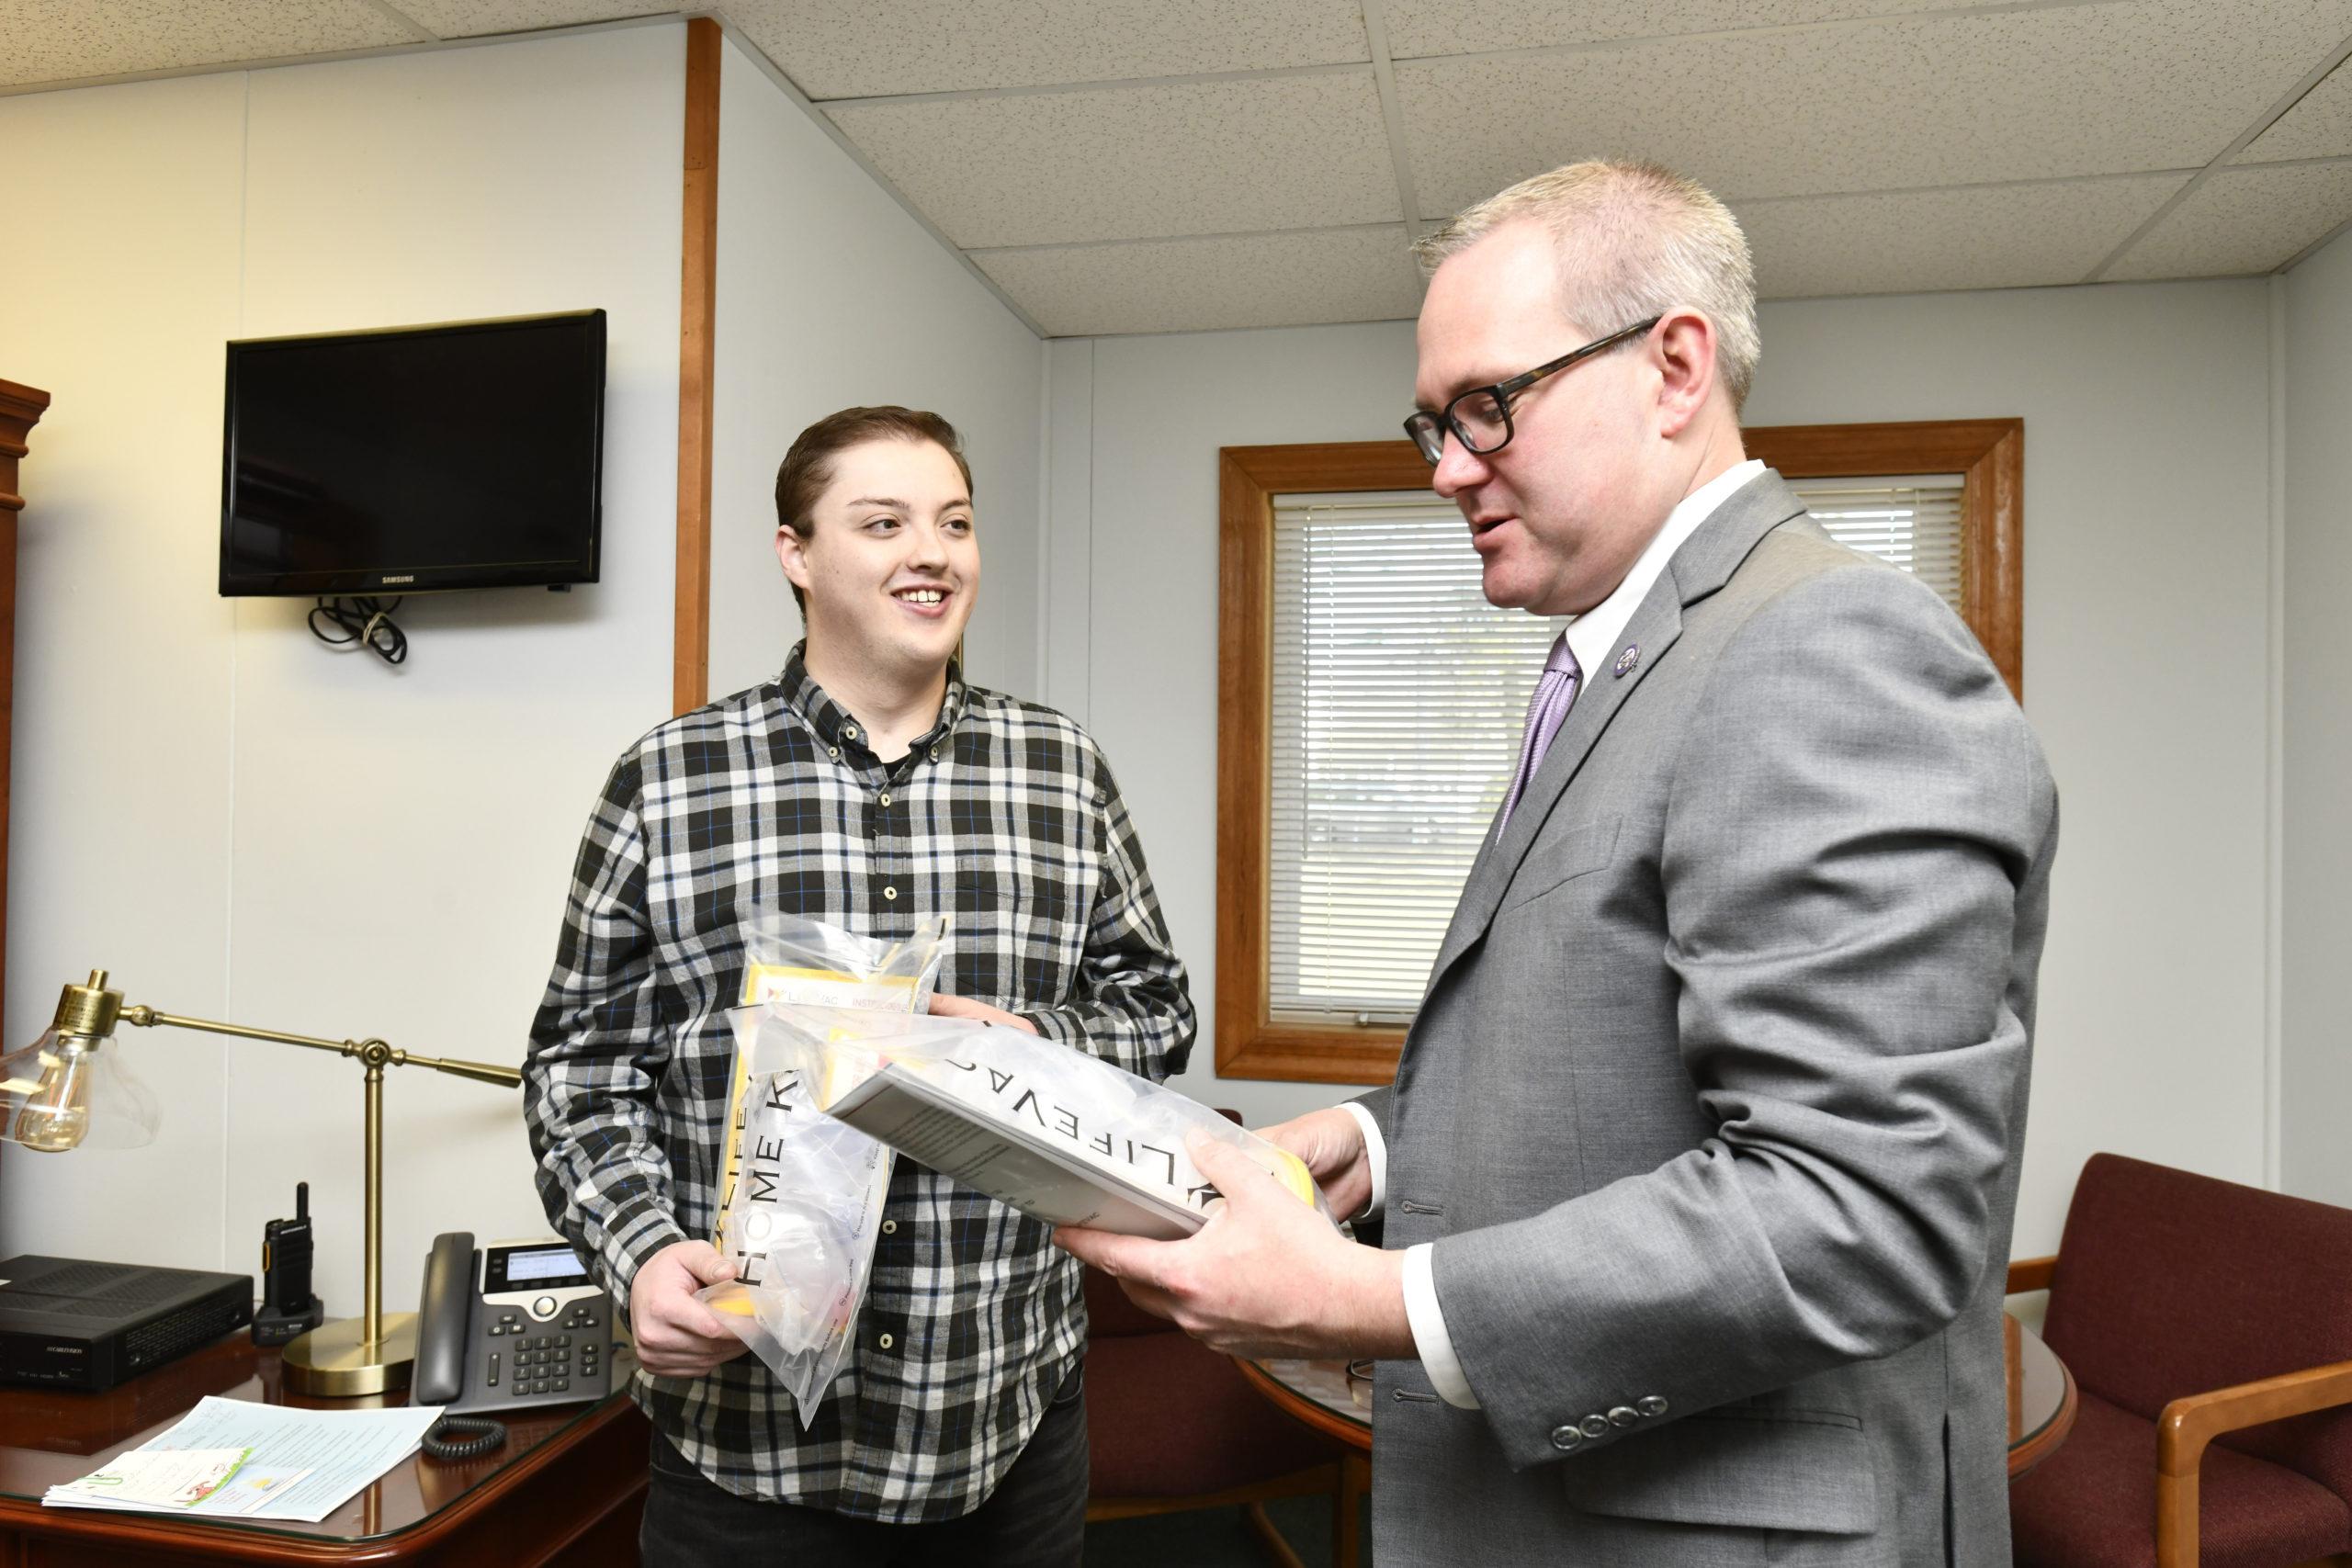 Dylan Musso delivers LifeVac kits to Hampton Bays Superintendent of Schools Lars Clemensen last week.   DANA SHAW